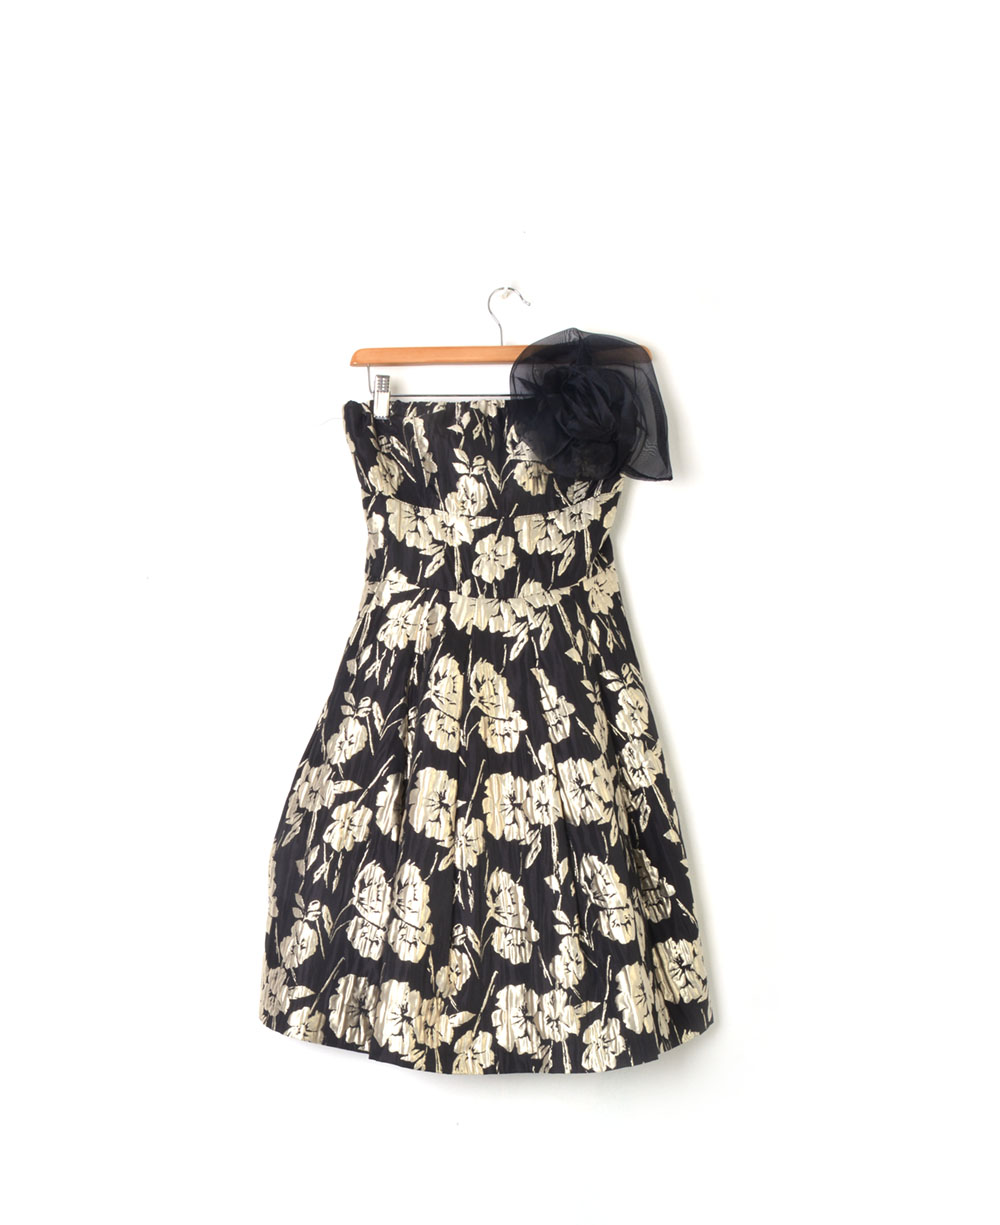 Vestido negro con flores doradas